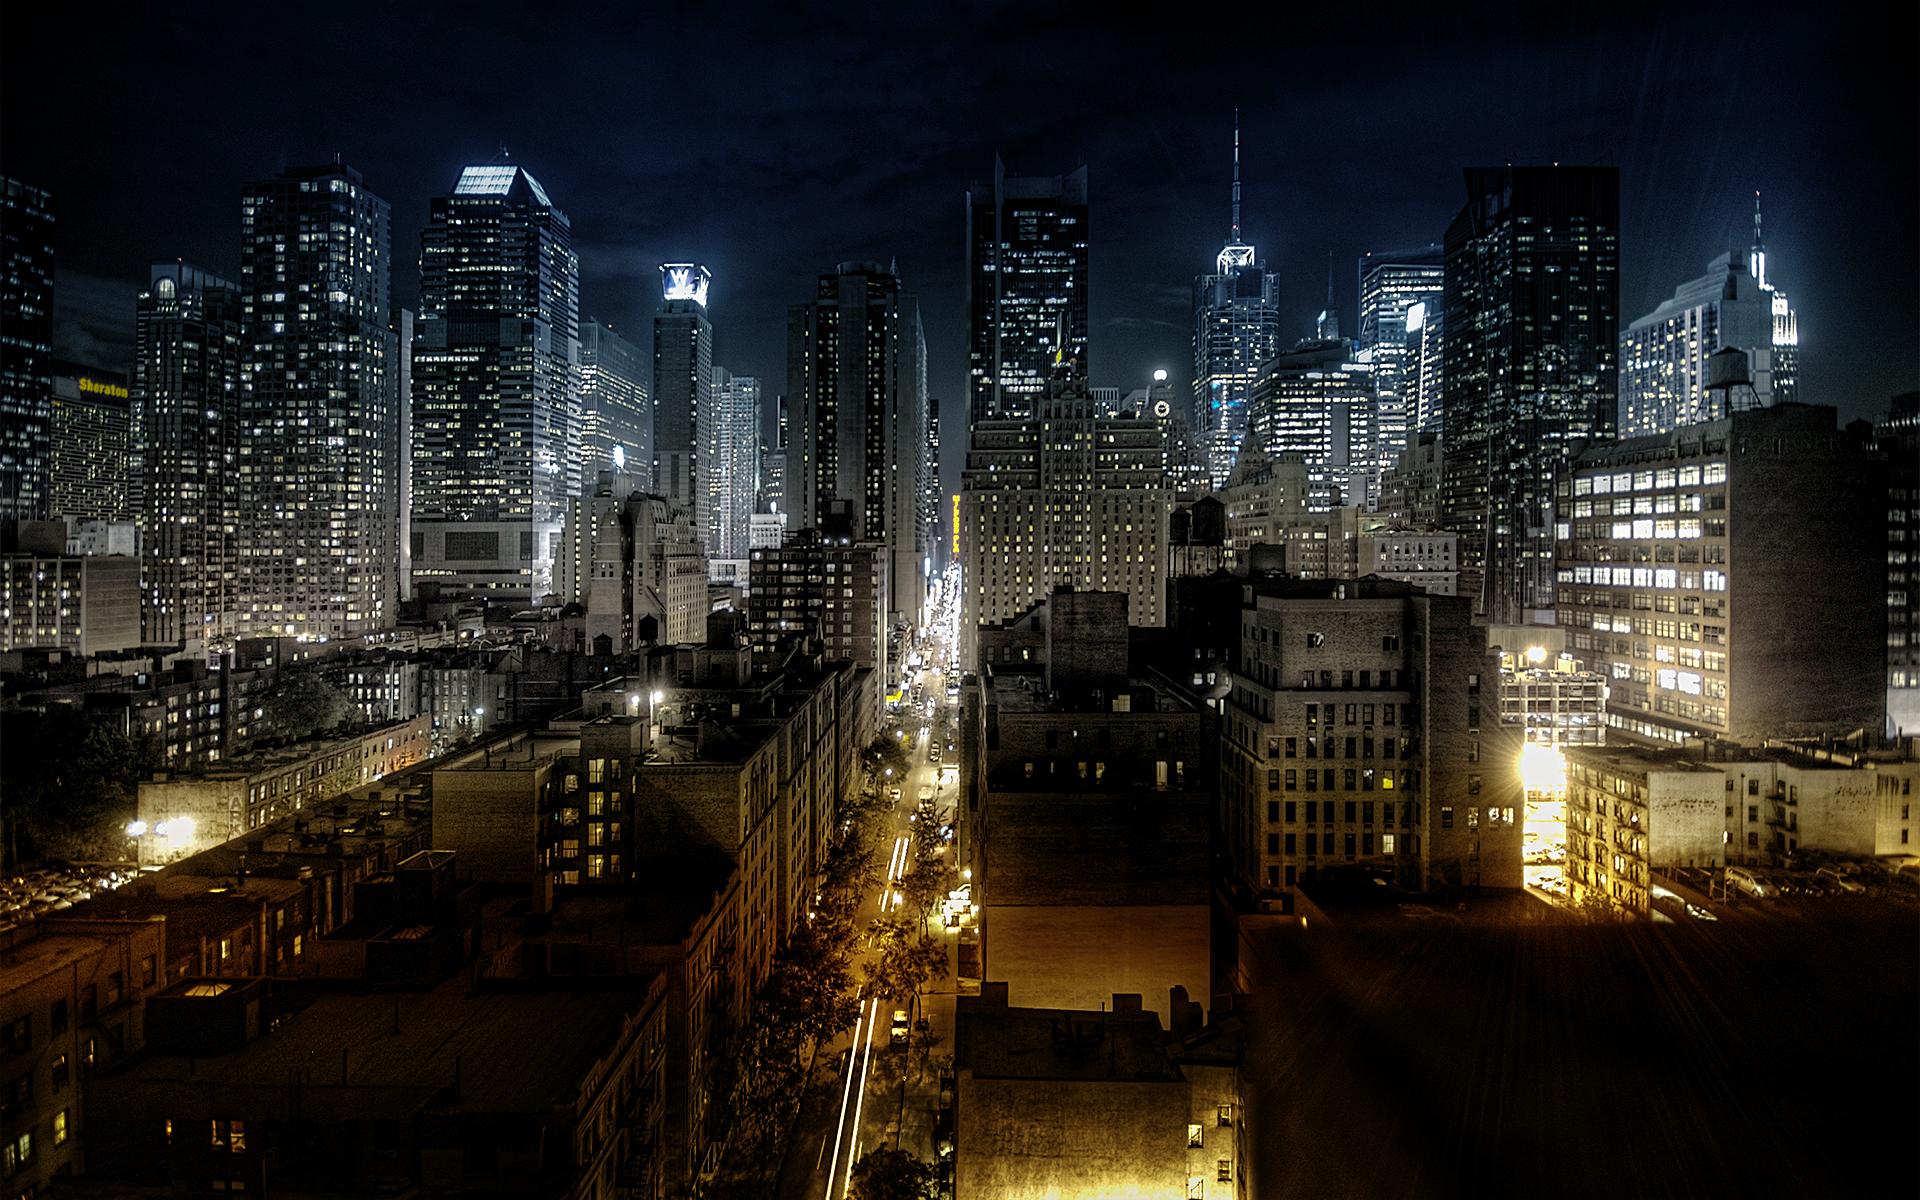 Download Cityscapes Night Wallpaper 1920x1200 Wallpoper 1920x1200